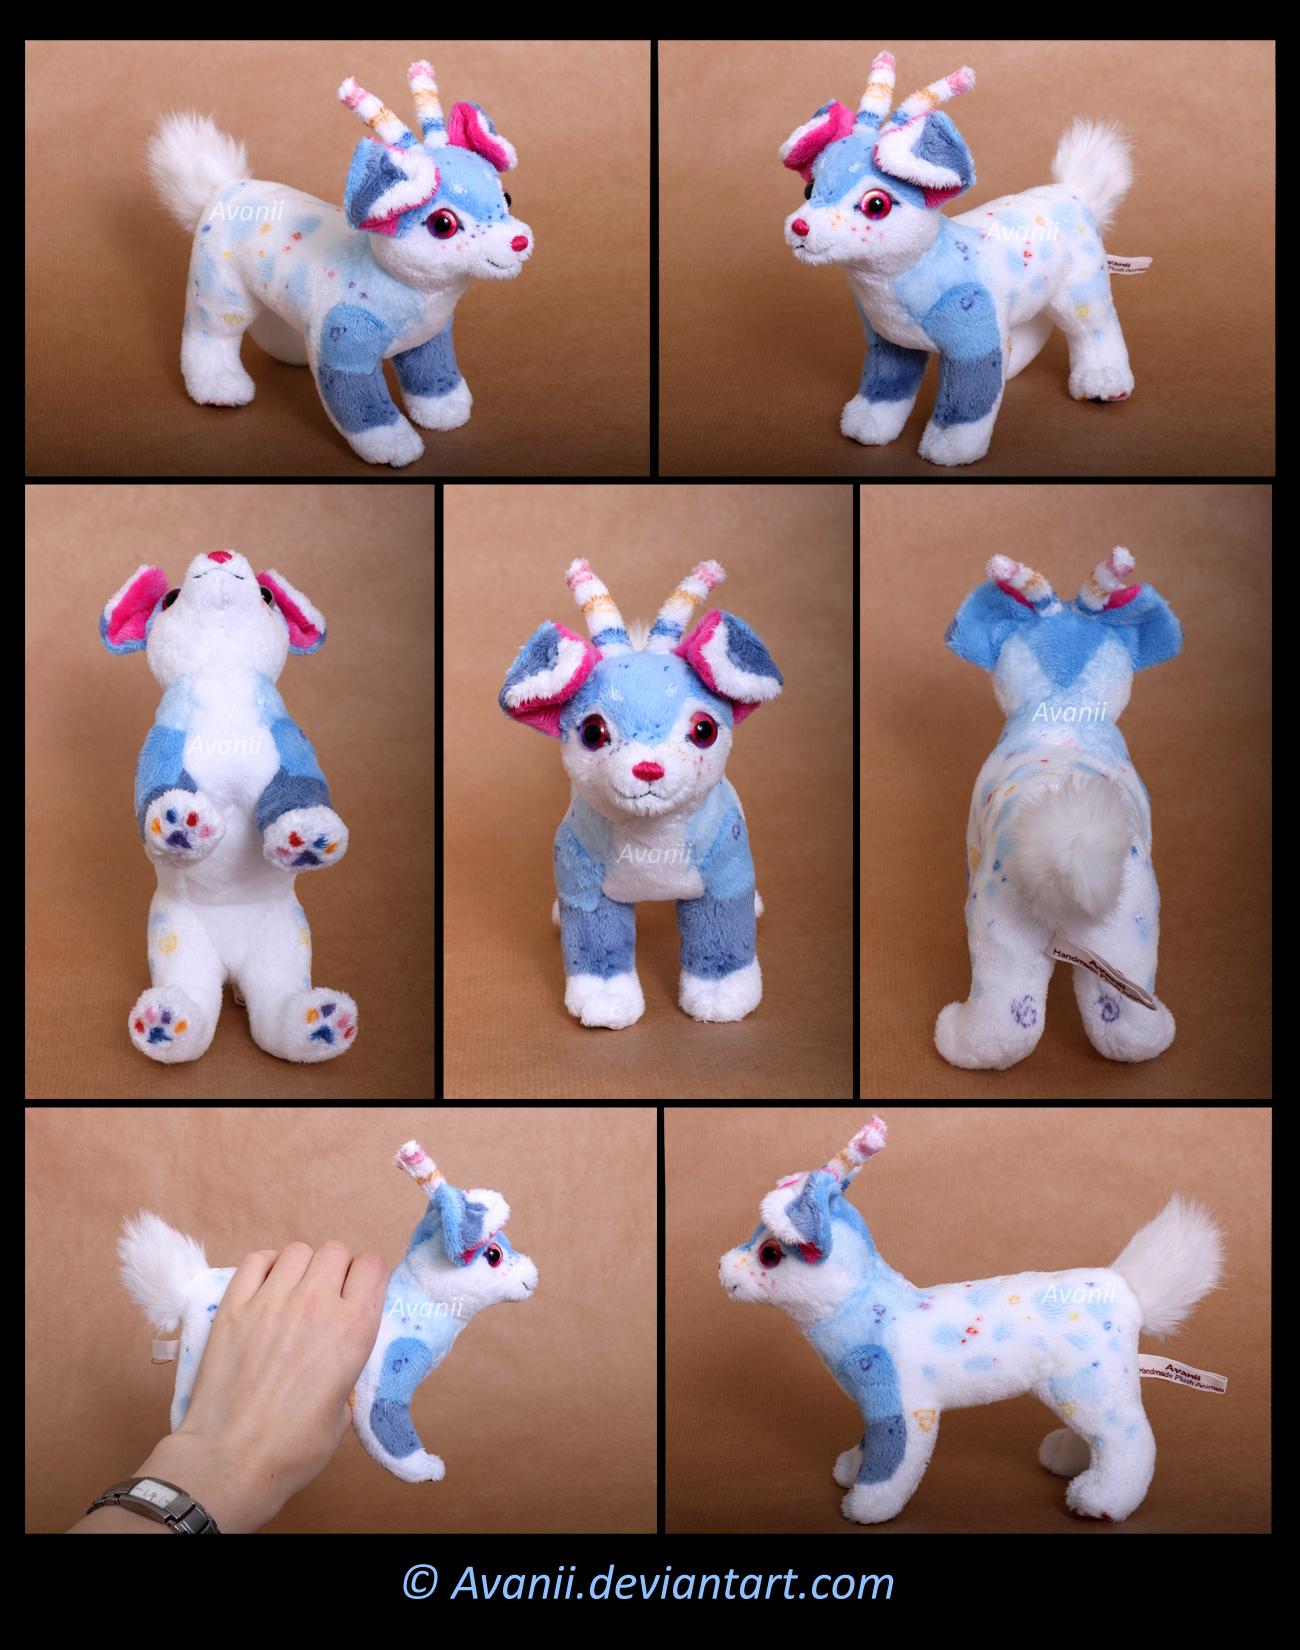 Plushie Commission: Otis the Aliendog by Avanii